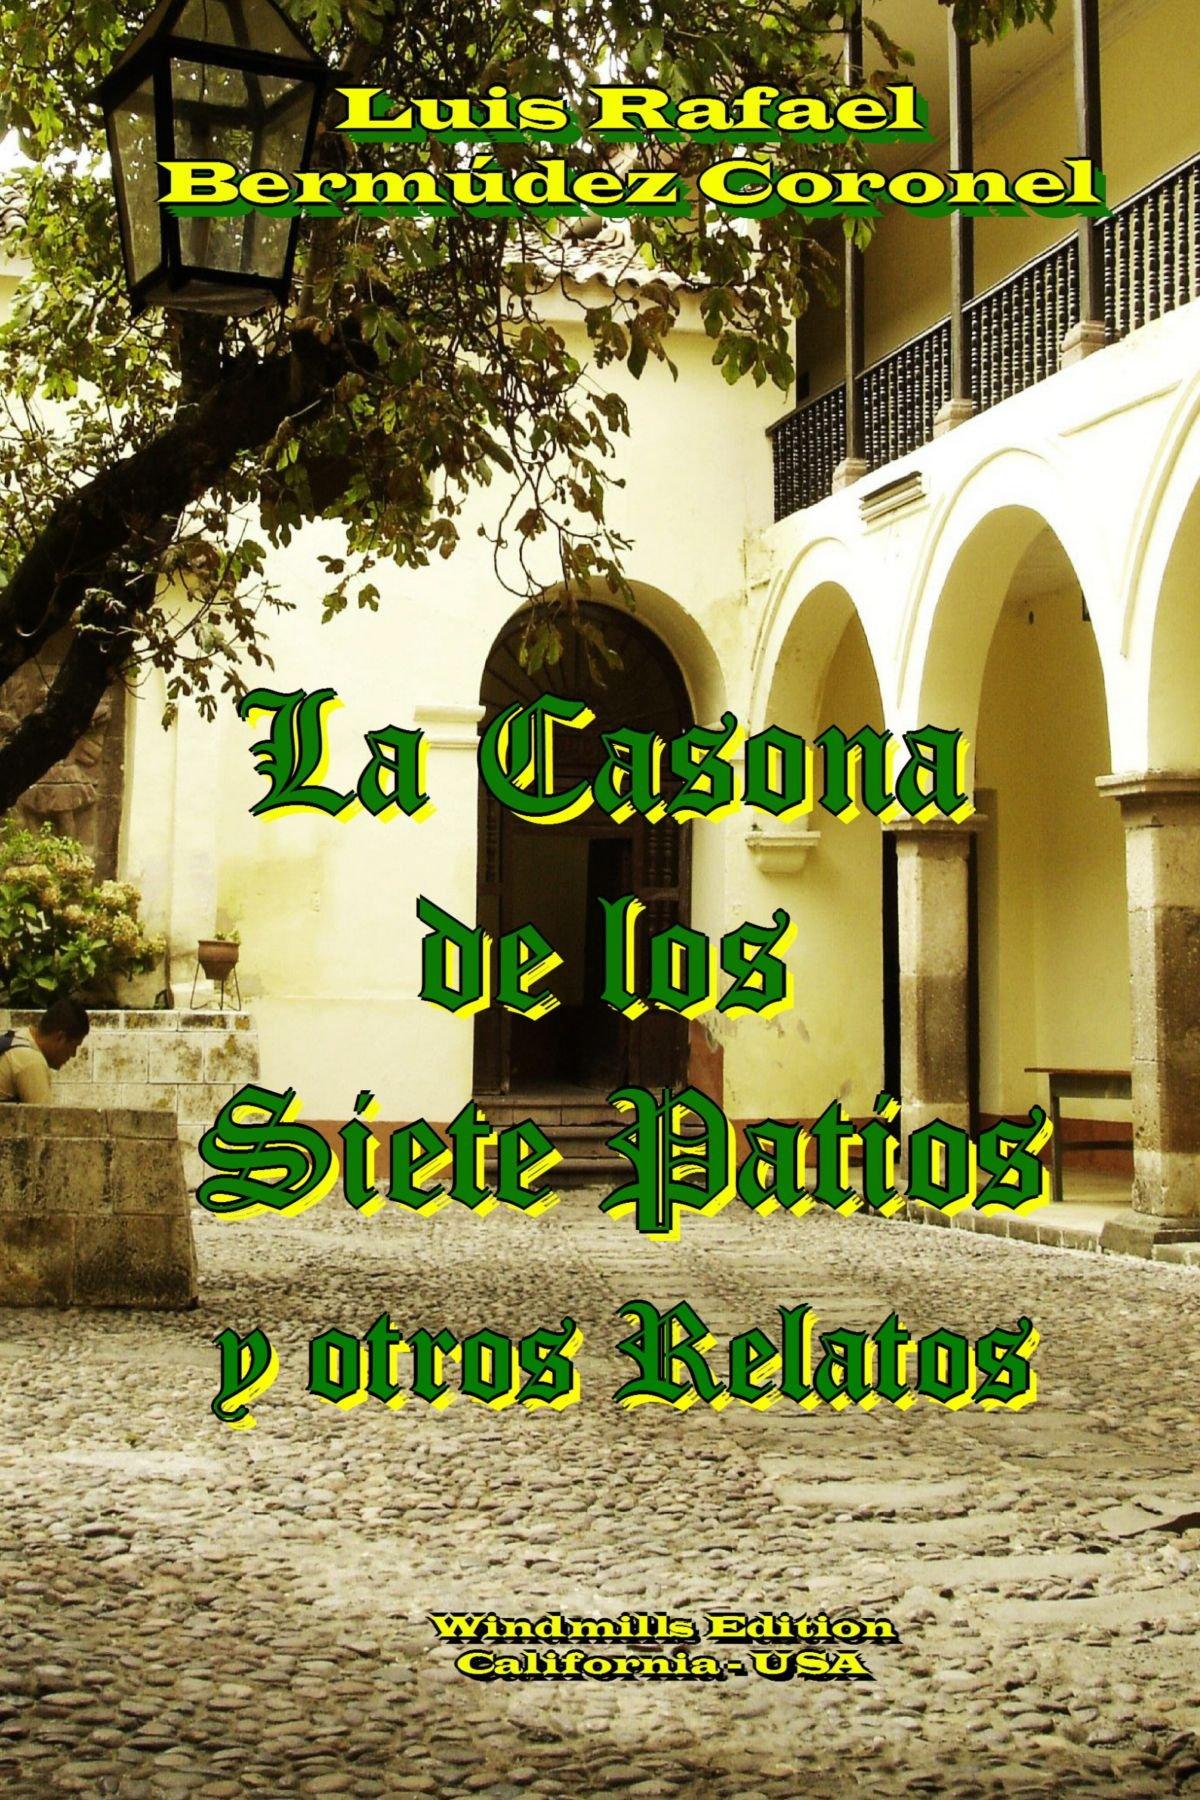 La casona de los siete patios (Spanish Edition): Luis Rafael Bermúdez Coronel: 9780557954124: Amazon.com: Books